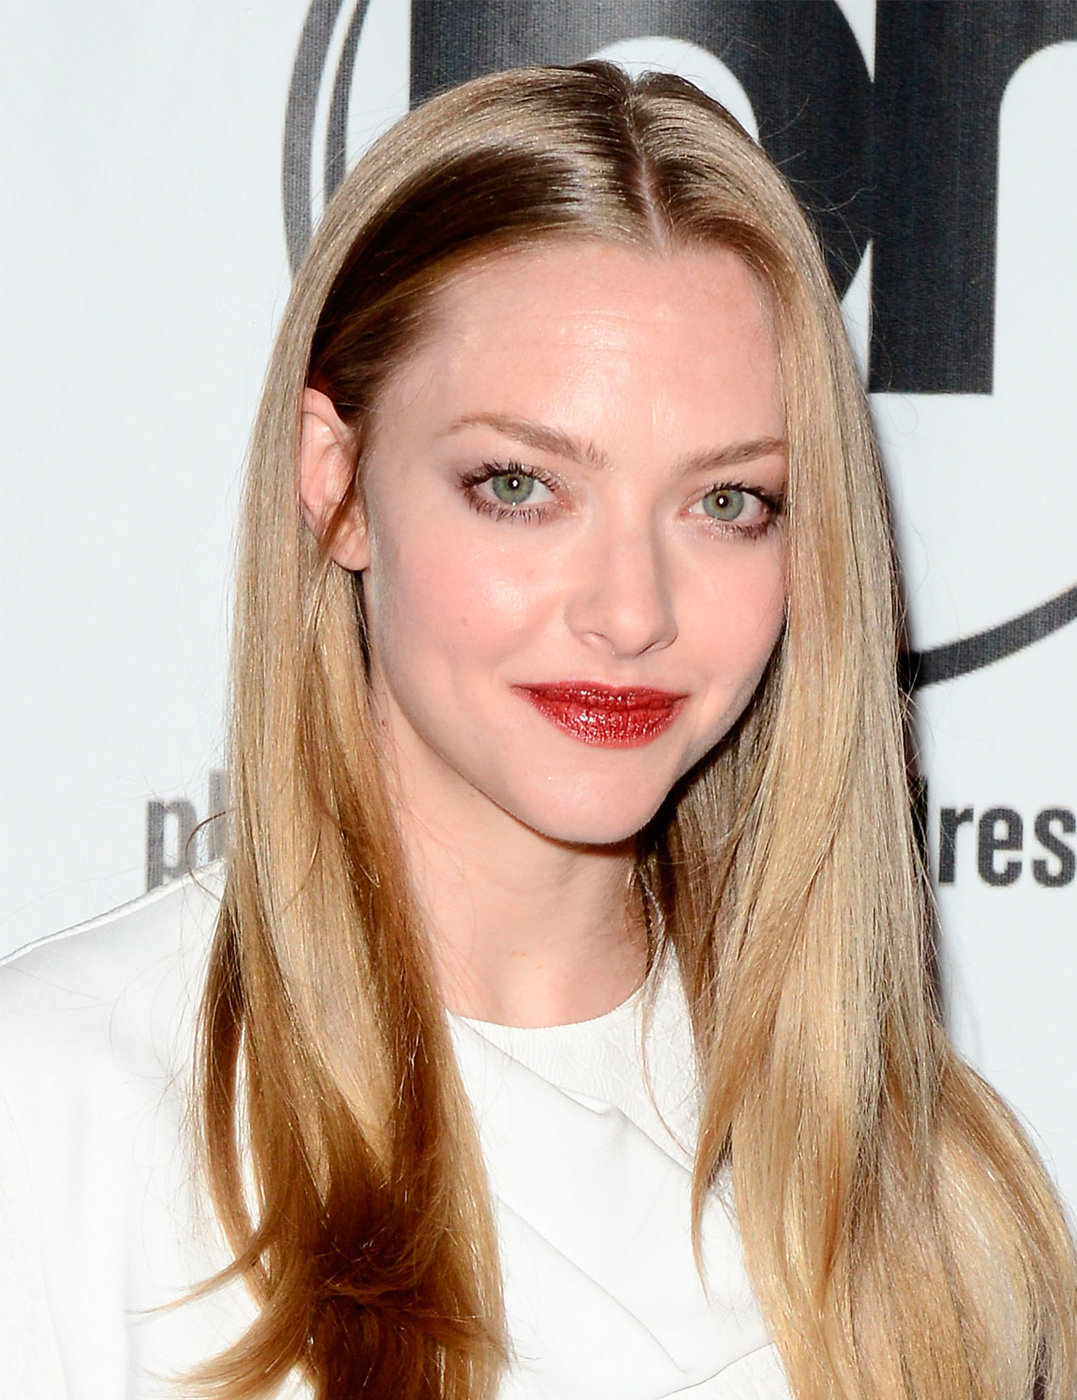 50 best celebrity makeup 2013